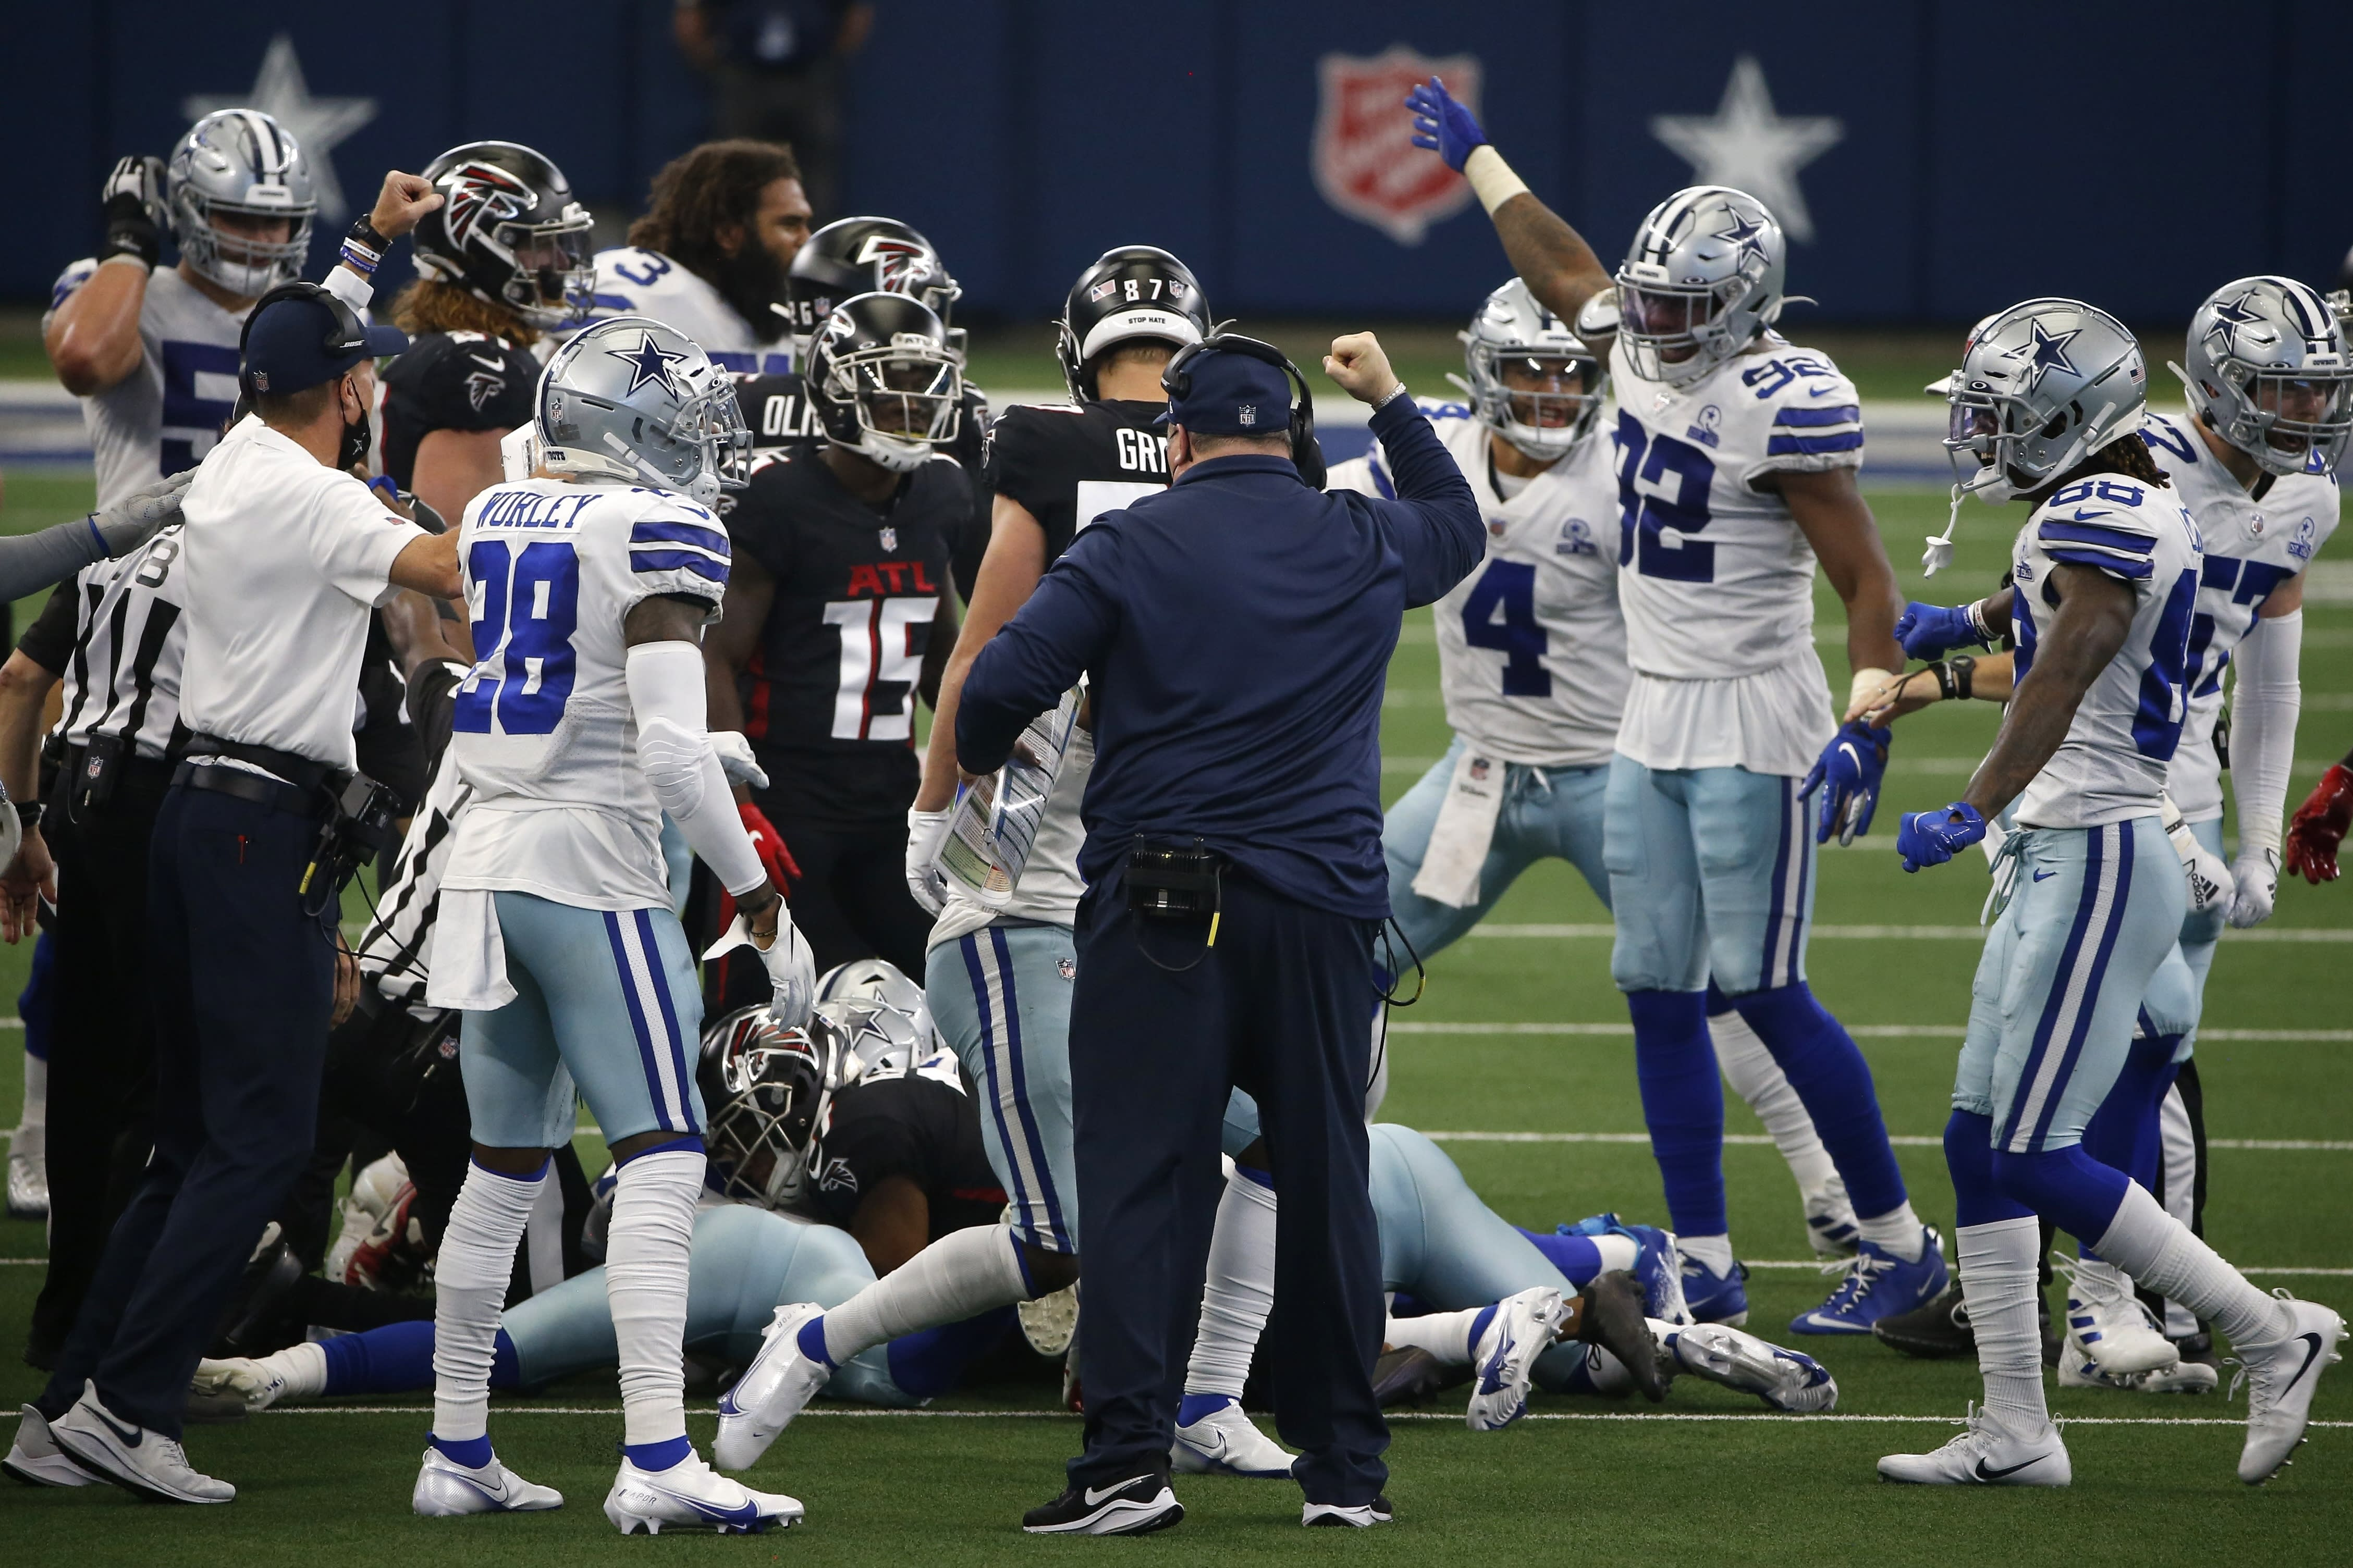 Mike McCarthy shows he's not Jason Garrett in Cowboys' win